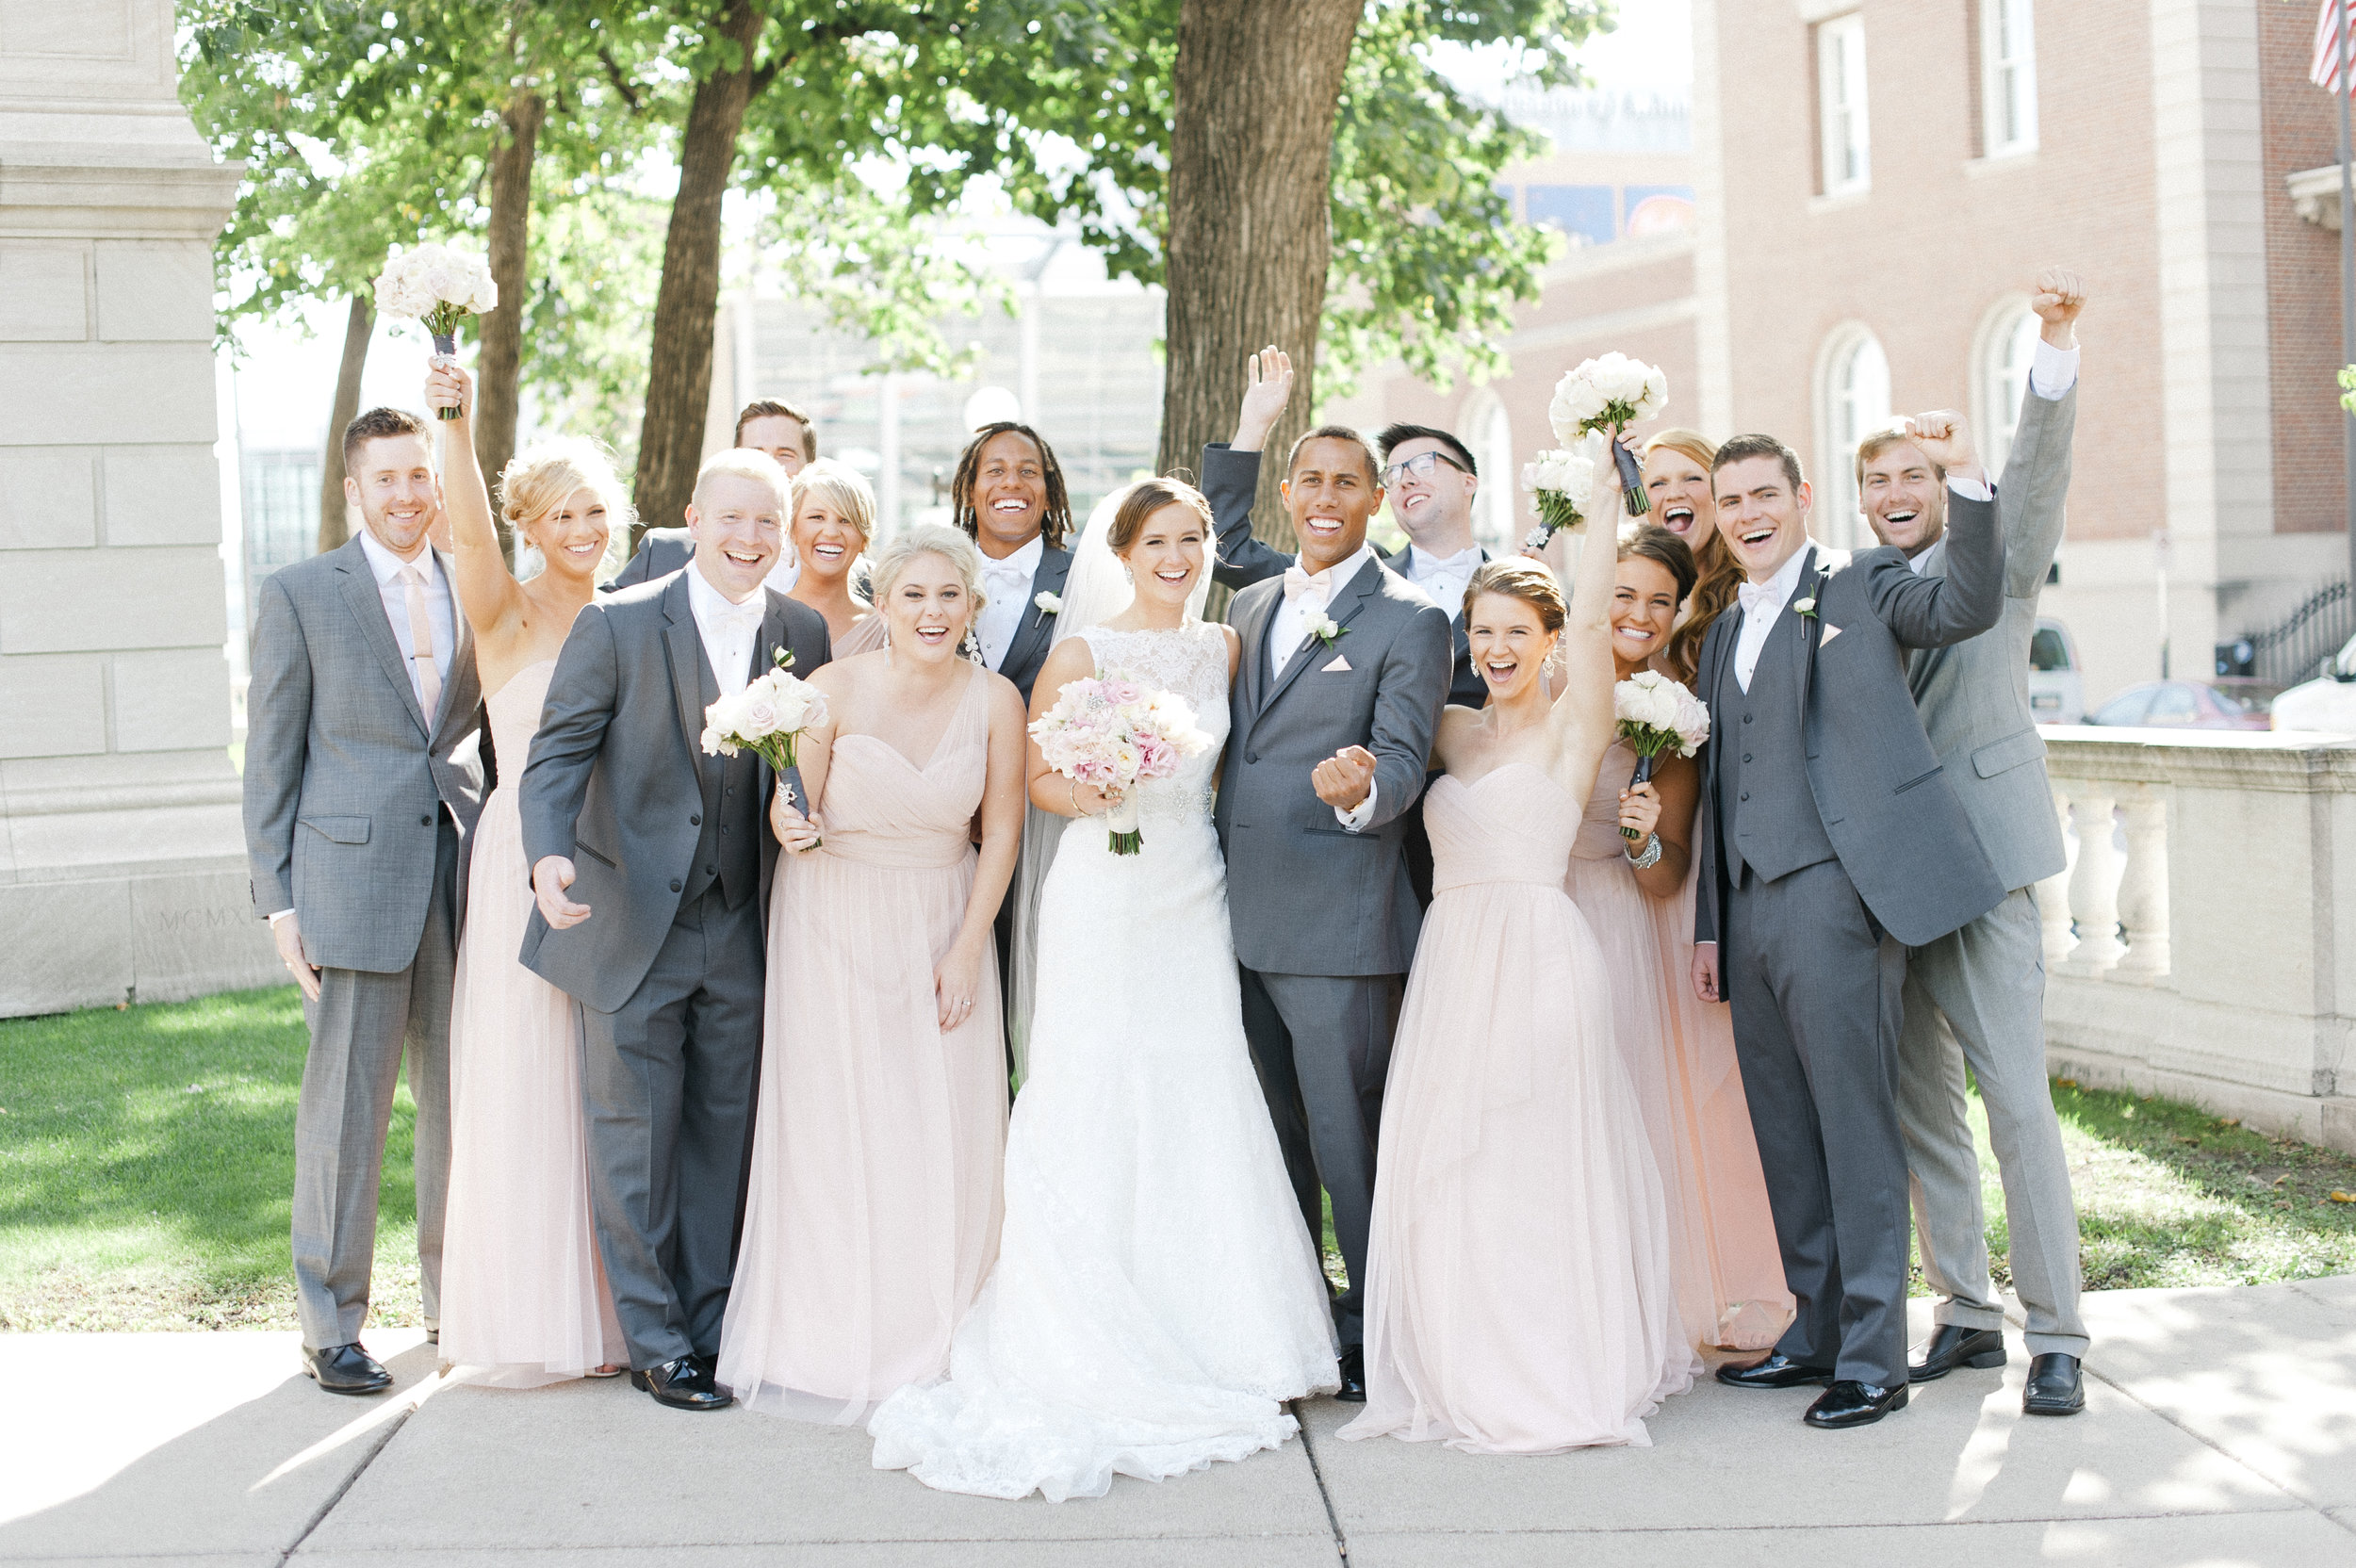 Lovell-Dillahunty Wedding_323.jpg